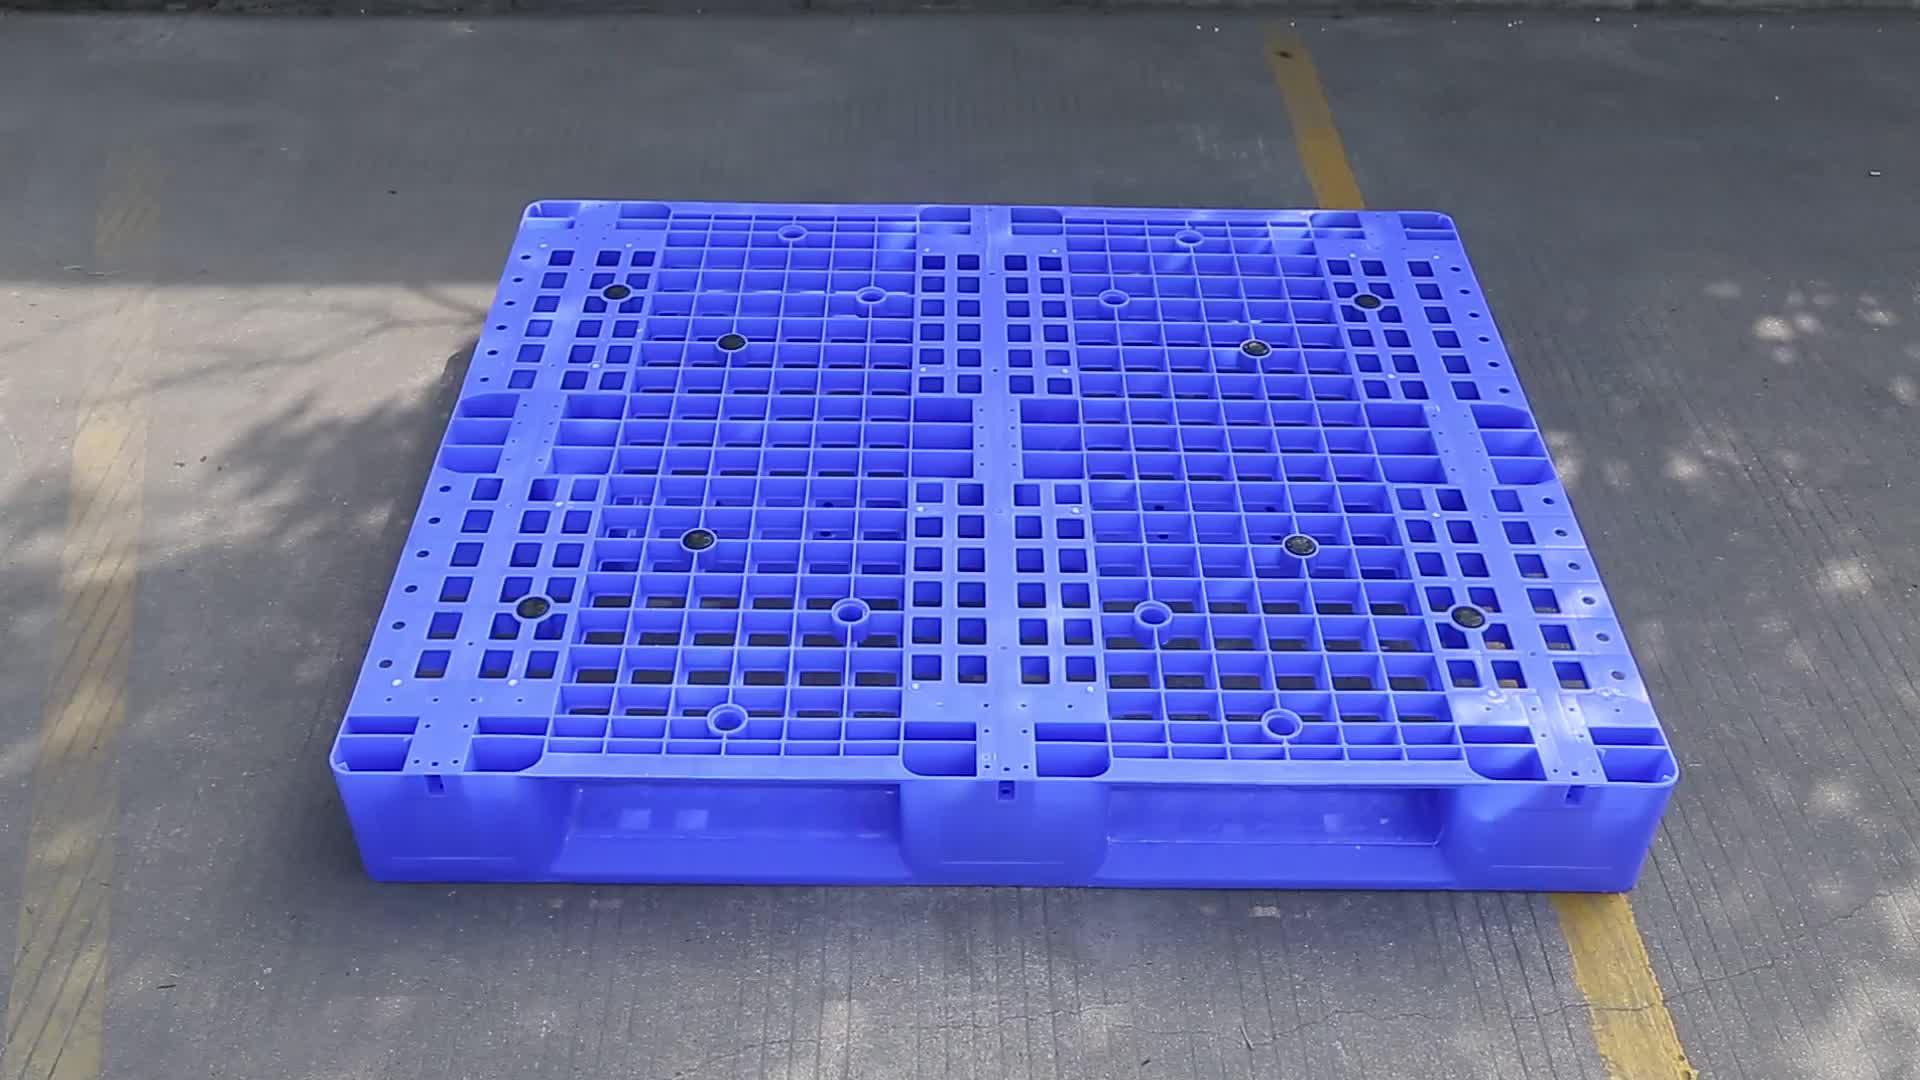 1200*1000 कुंवारी एचडीपीई सामग्री स्टील प्रबलित चावल बियर के लिए यूरो औद्योगिक चालाकी प्लास्टिक की चटाई